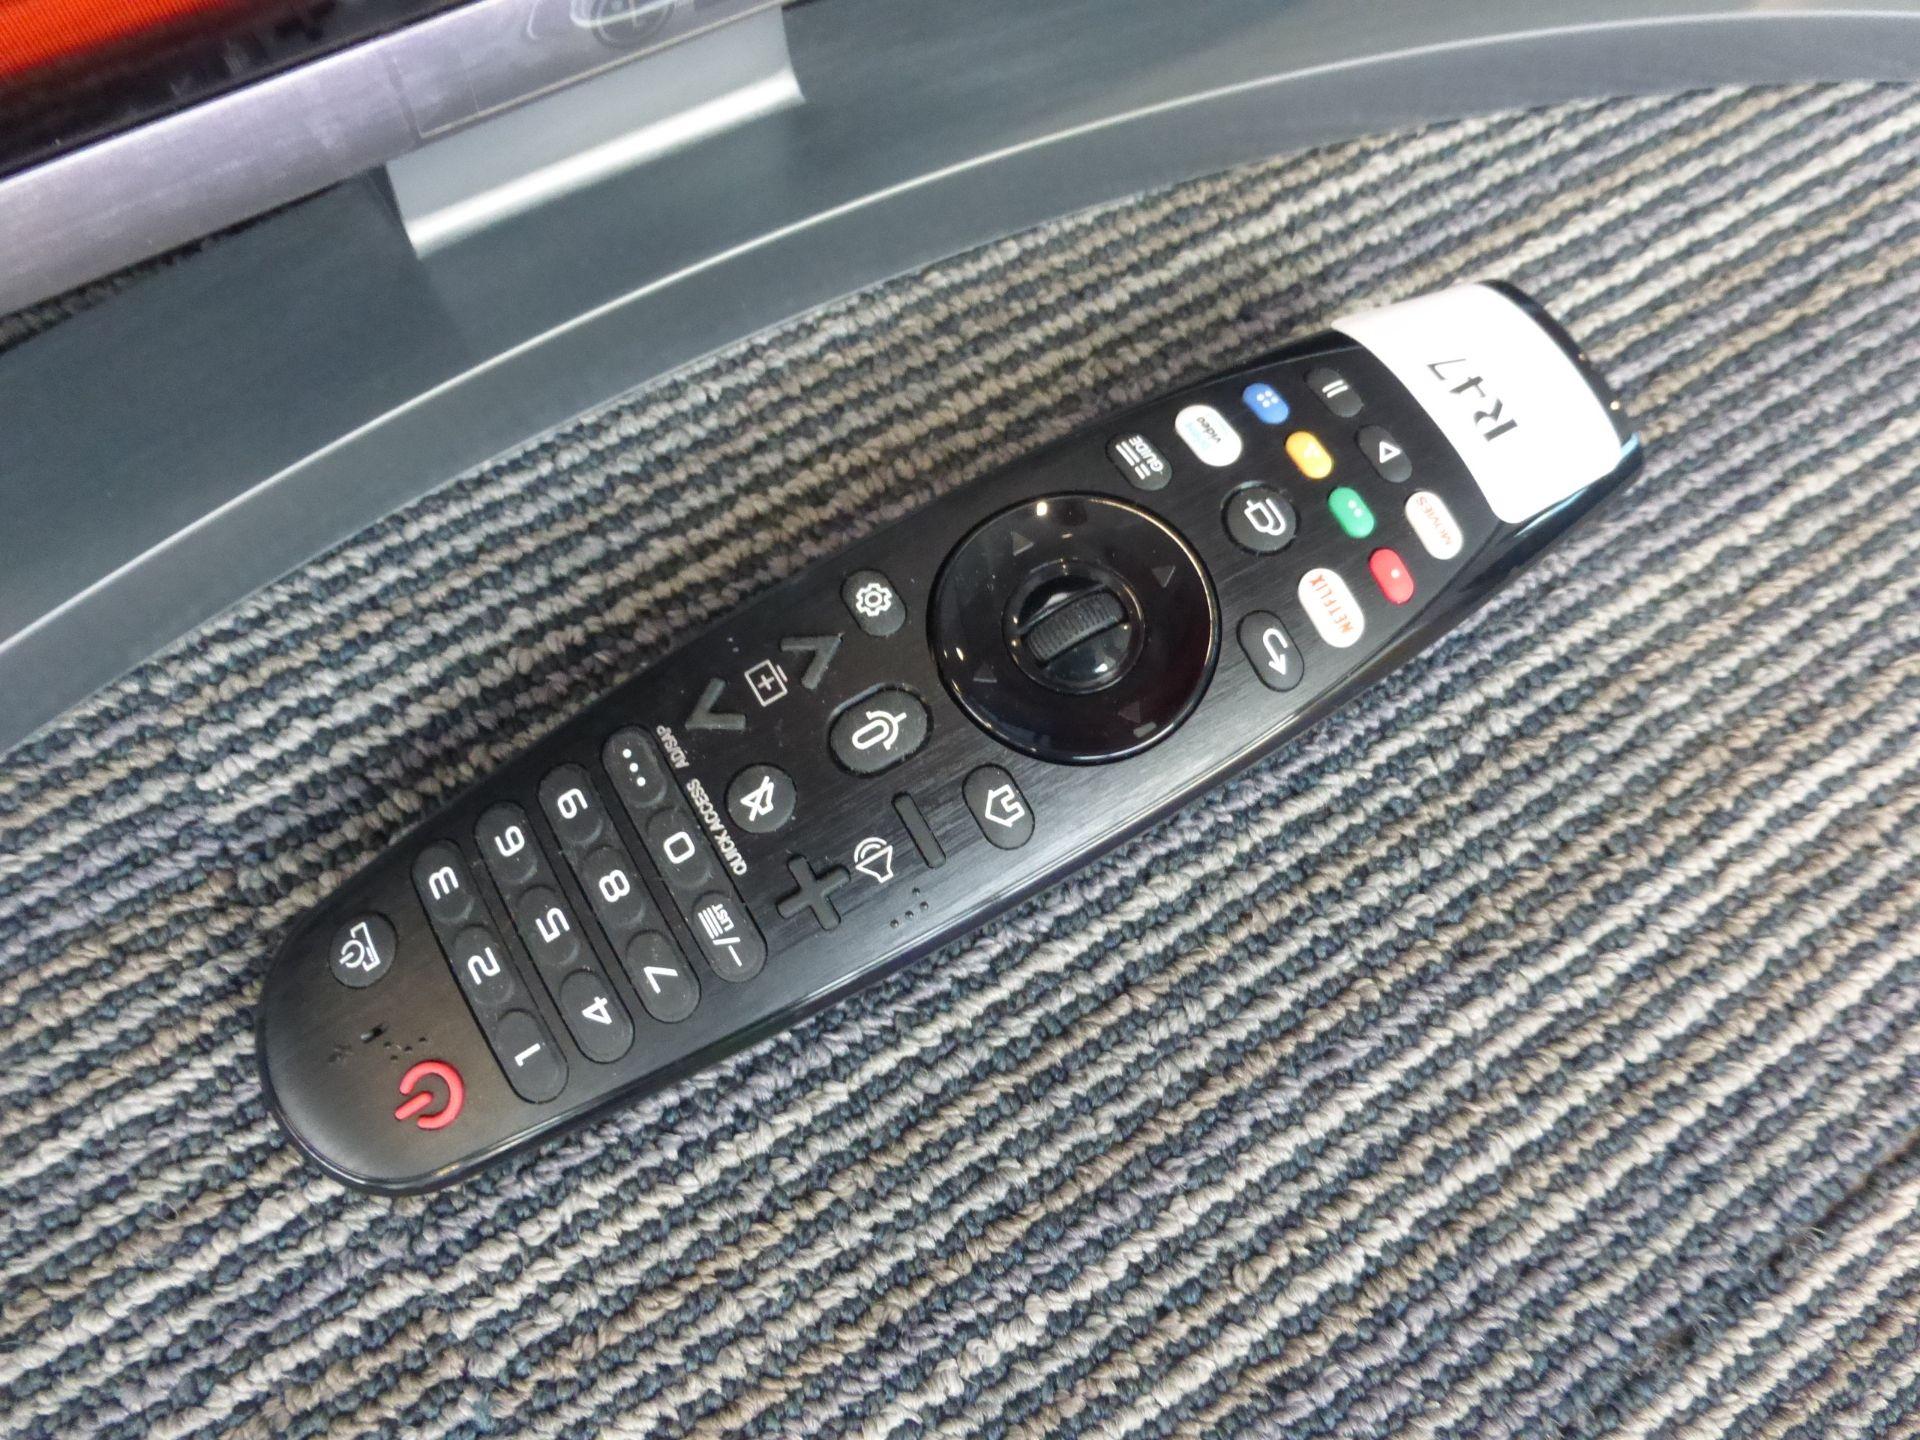 LG 65'' 4K TV Model: 65UN81006LB, includes remote (R47) and box (B63) Screen has no visible - Image 2 of 2